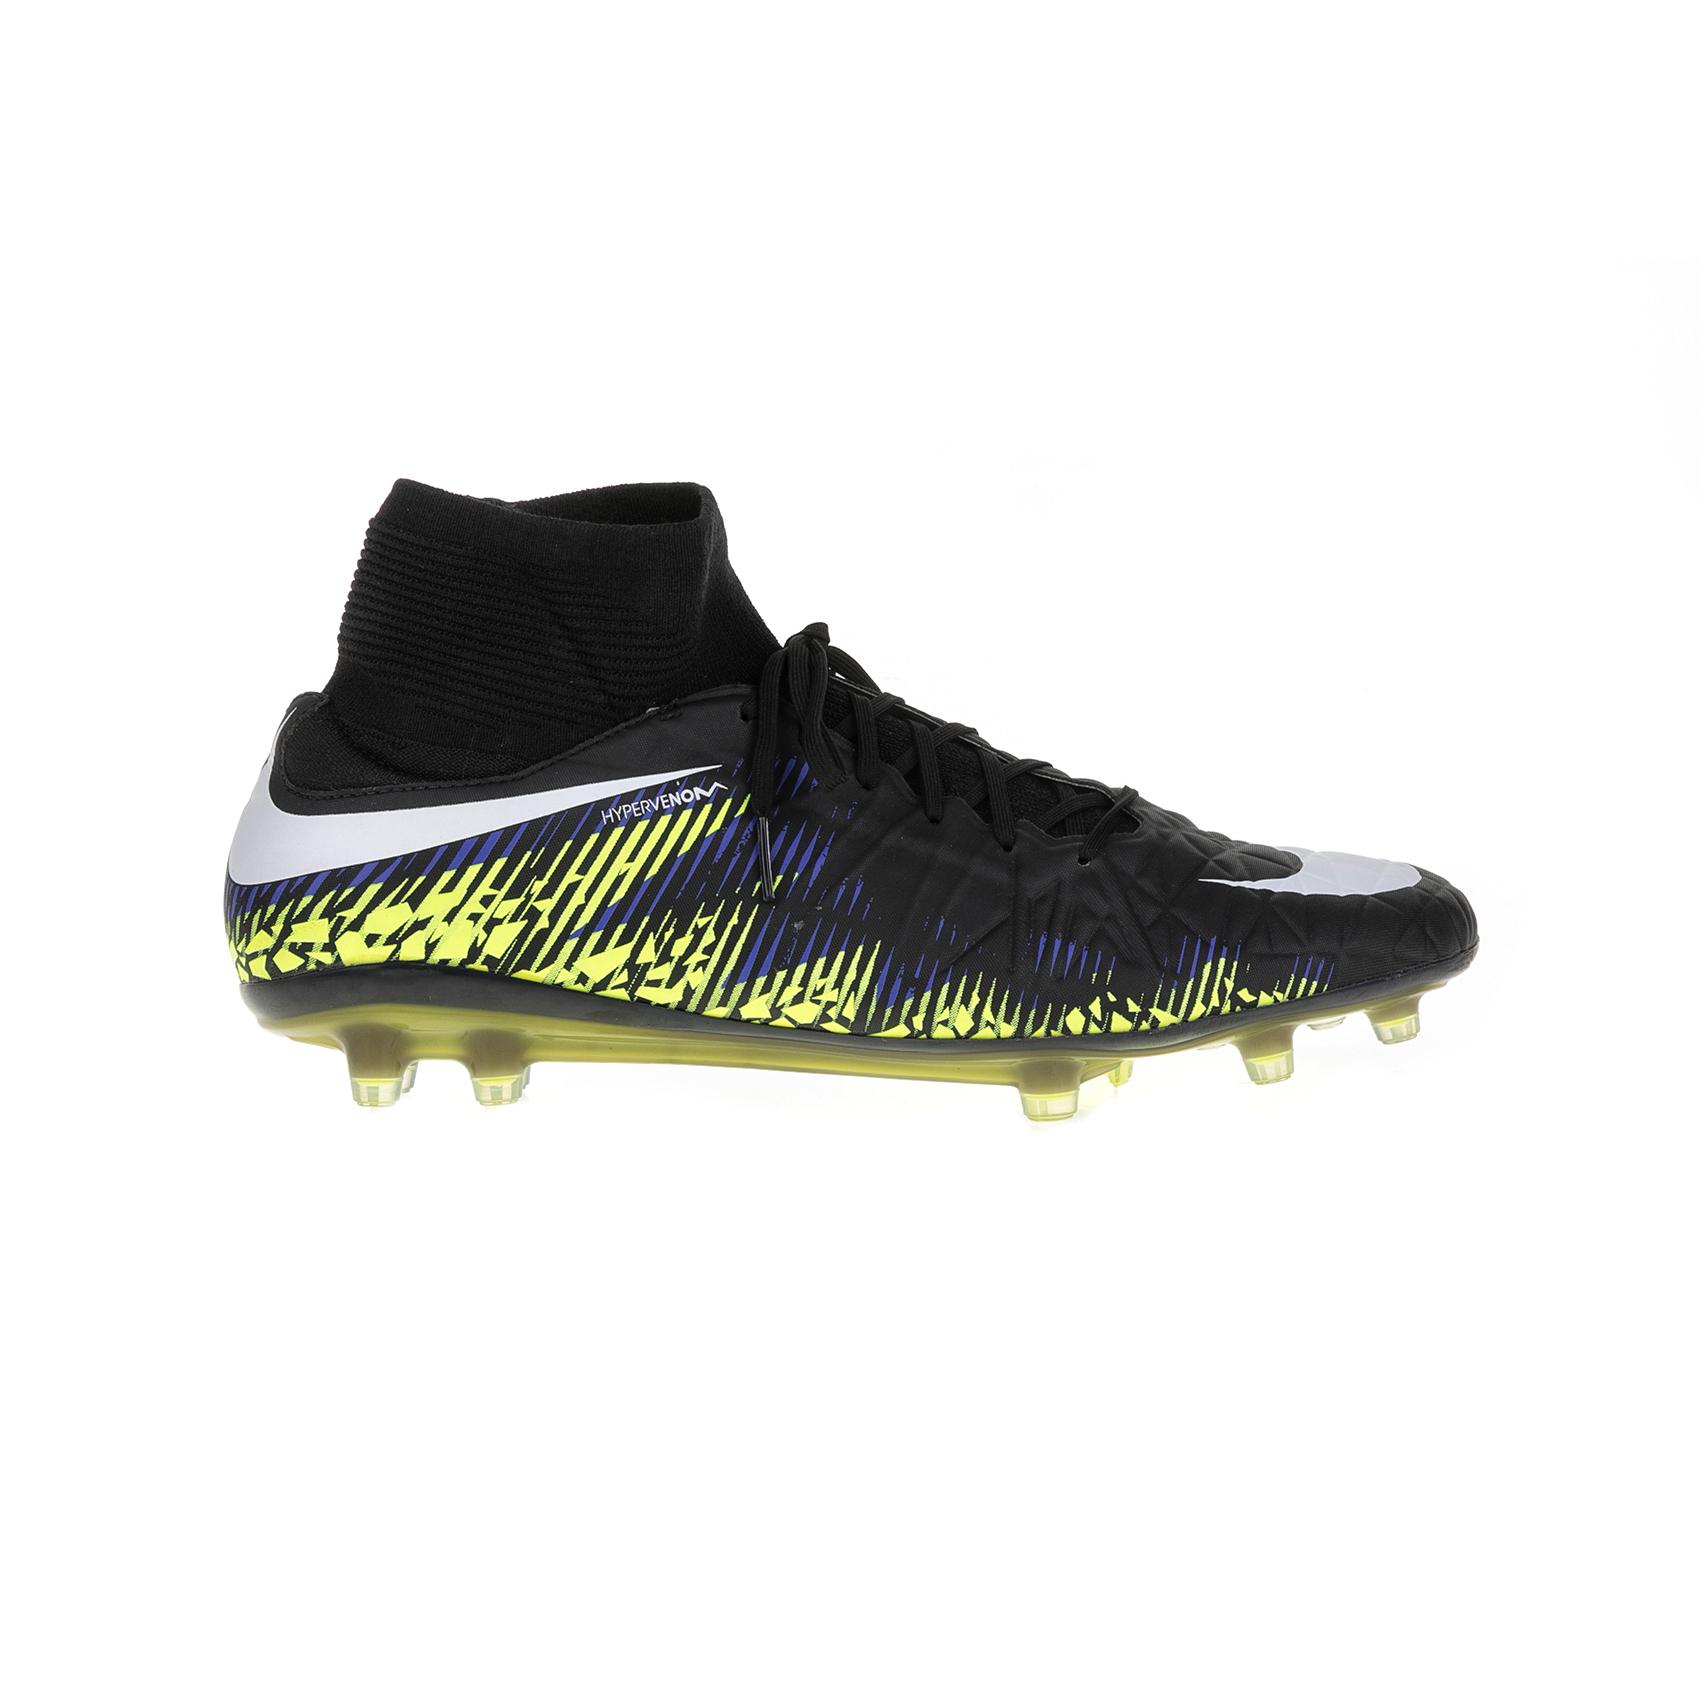 NIKE - Ανδρικά παπούτσια Nike Hypervenom Phatal II DF (FG) μαύρα ανδρικά παπούτσια αθλητικά football